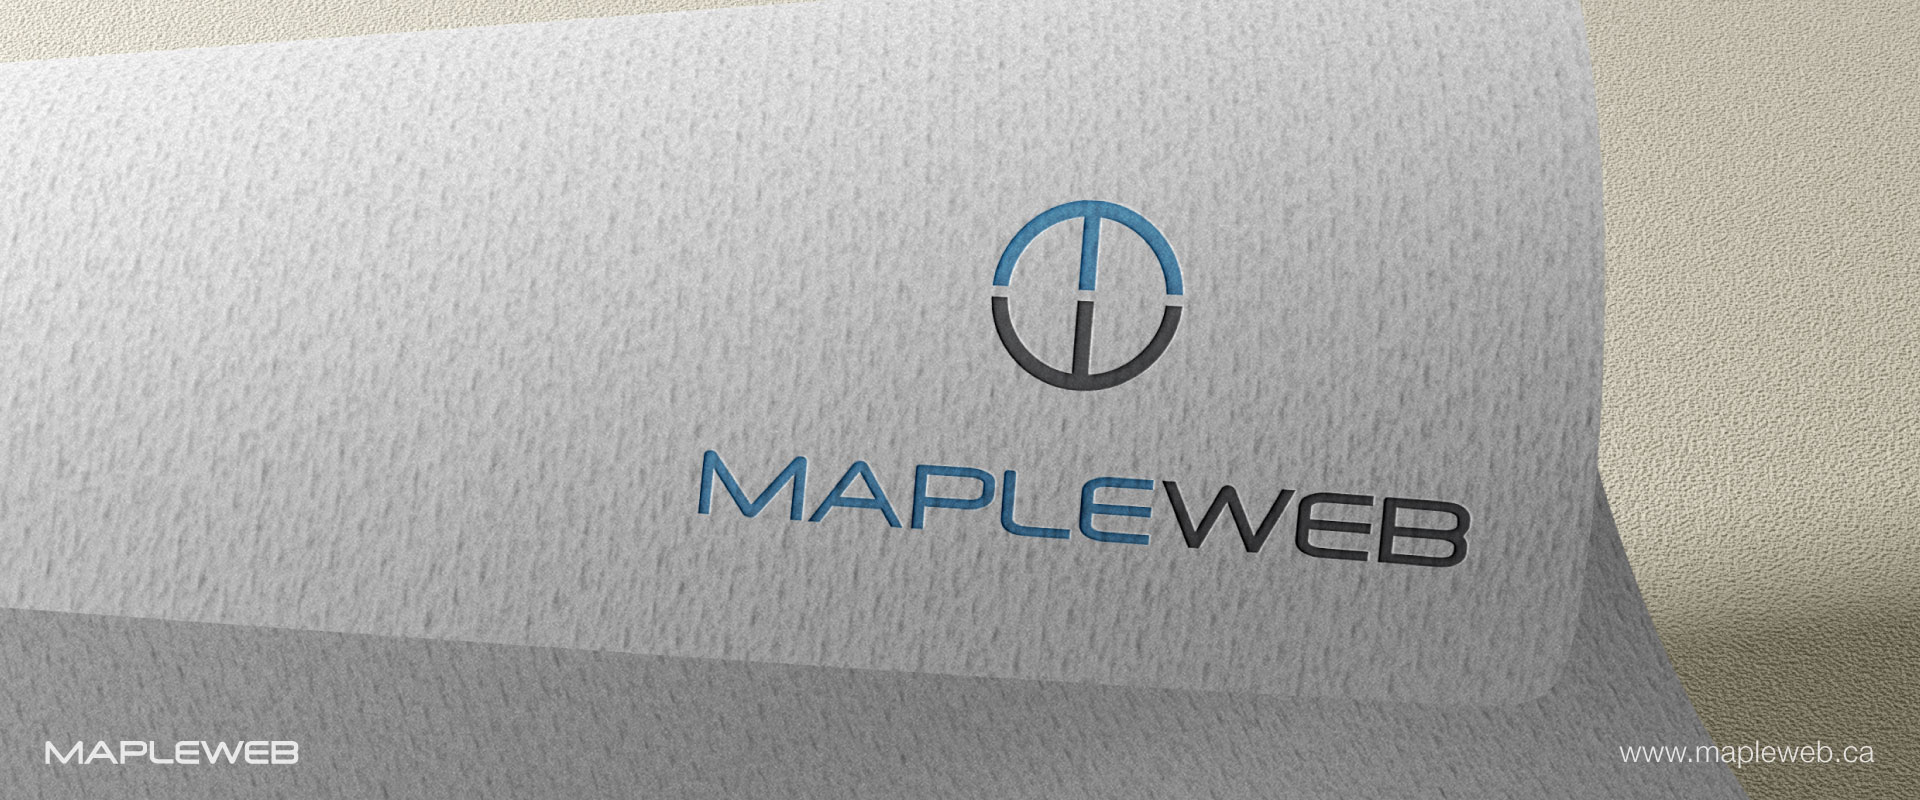 mapleweb-brand-logo-design-by-mapleweb-vancouver-canada-paper-mock